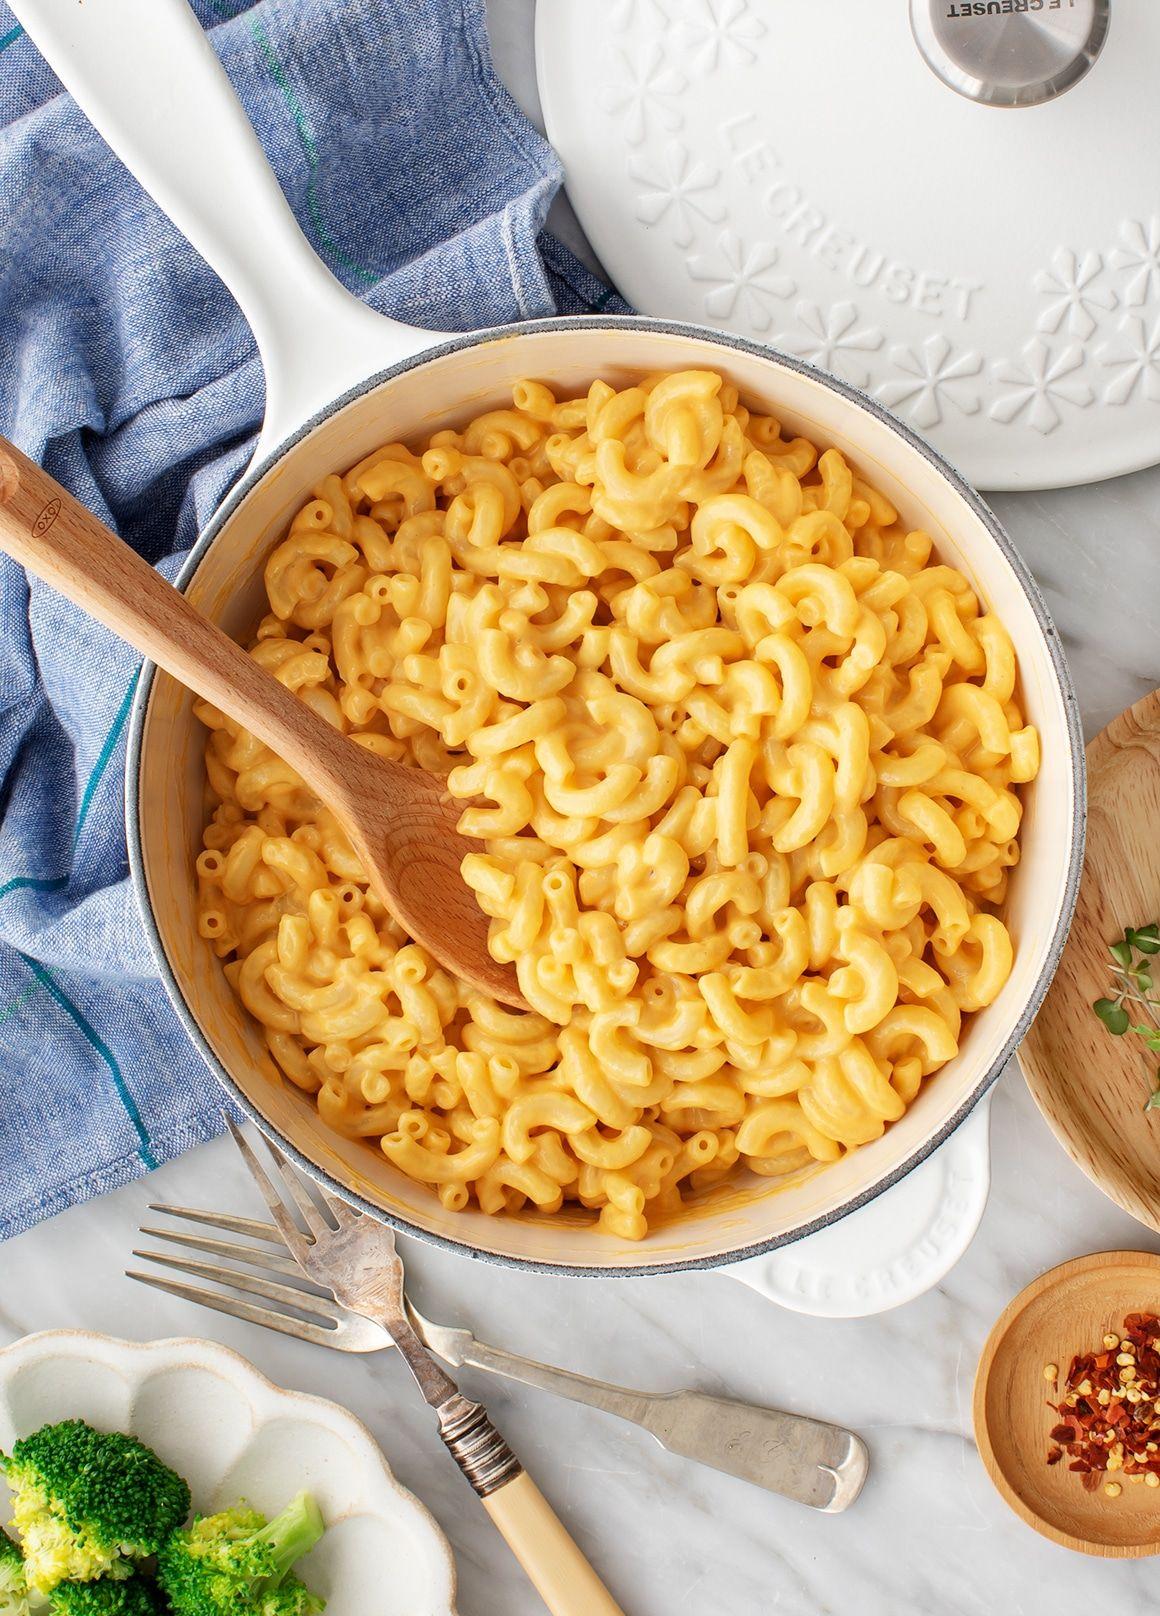 Vegan Mac And Cheese Recipe Love And Lemons Recipe In 2020 Vegan Mac And Cheese Yummy Pasta Recipes Mac And Cheese